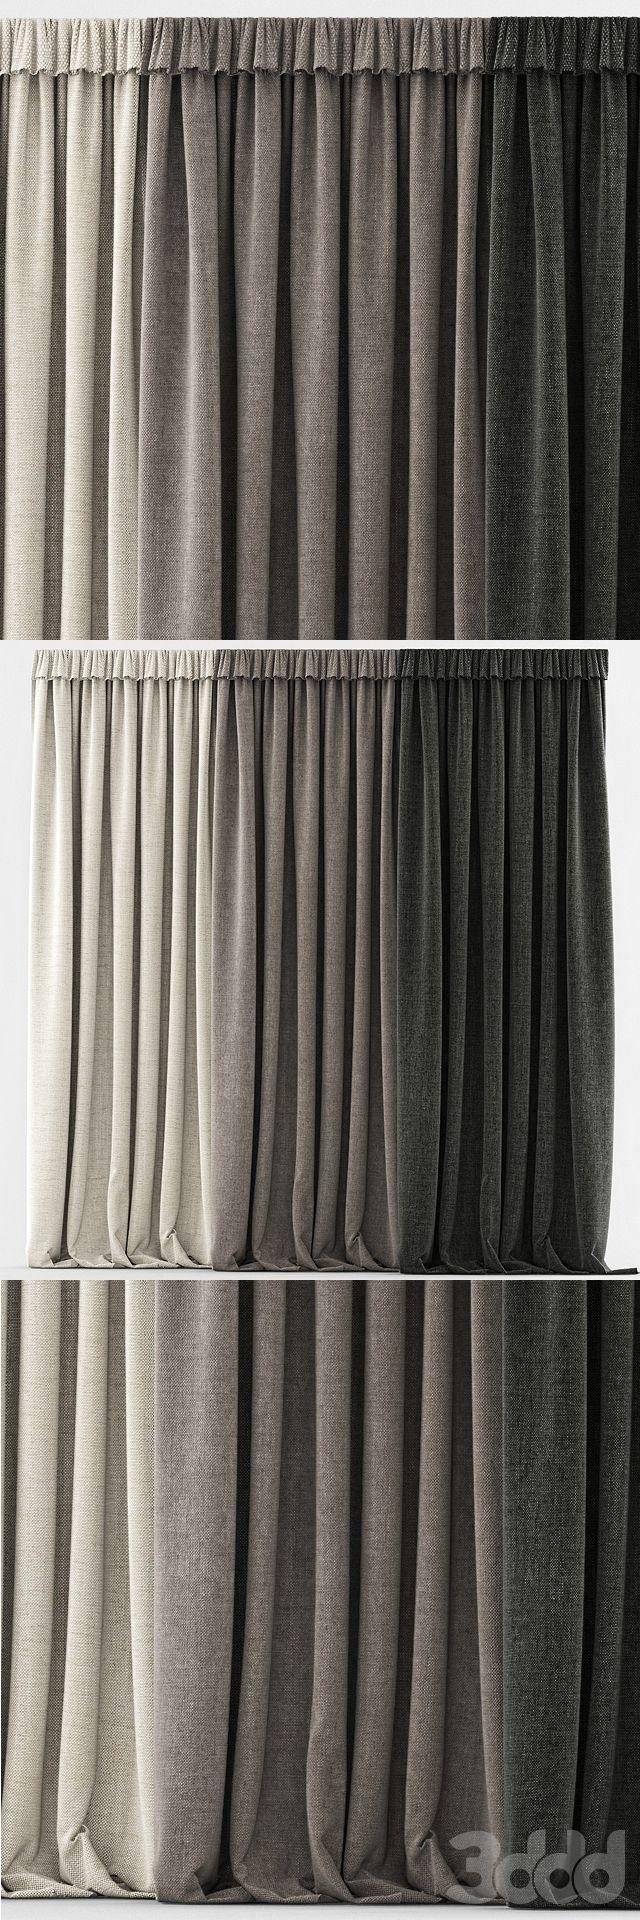 Curtains Fabric 2